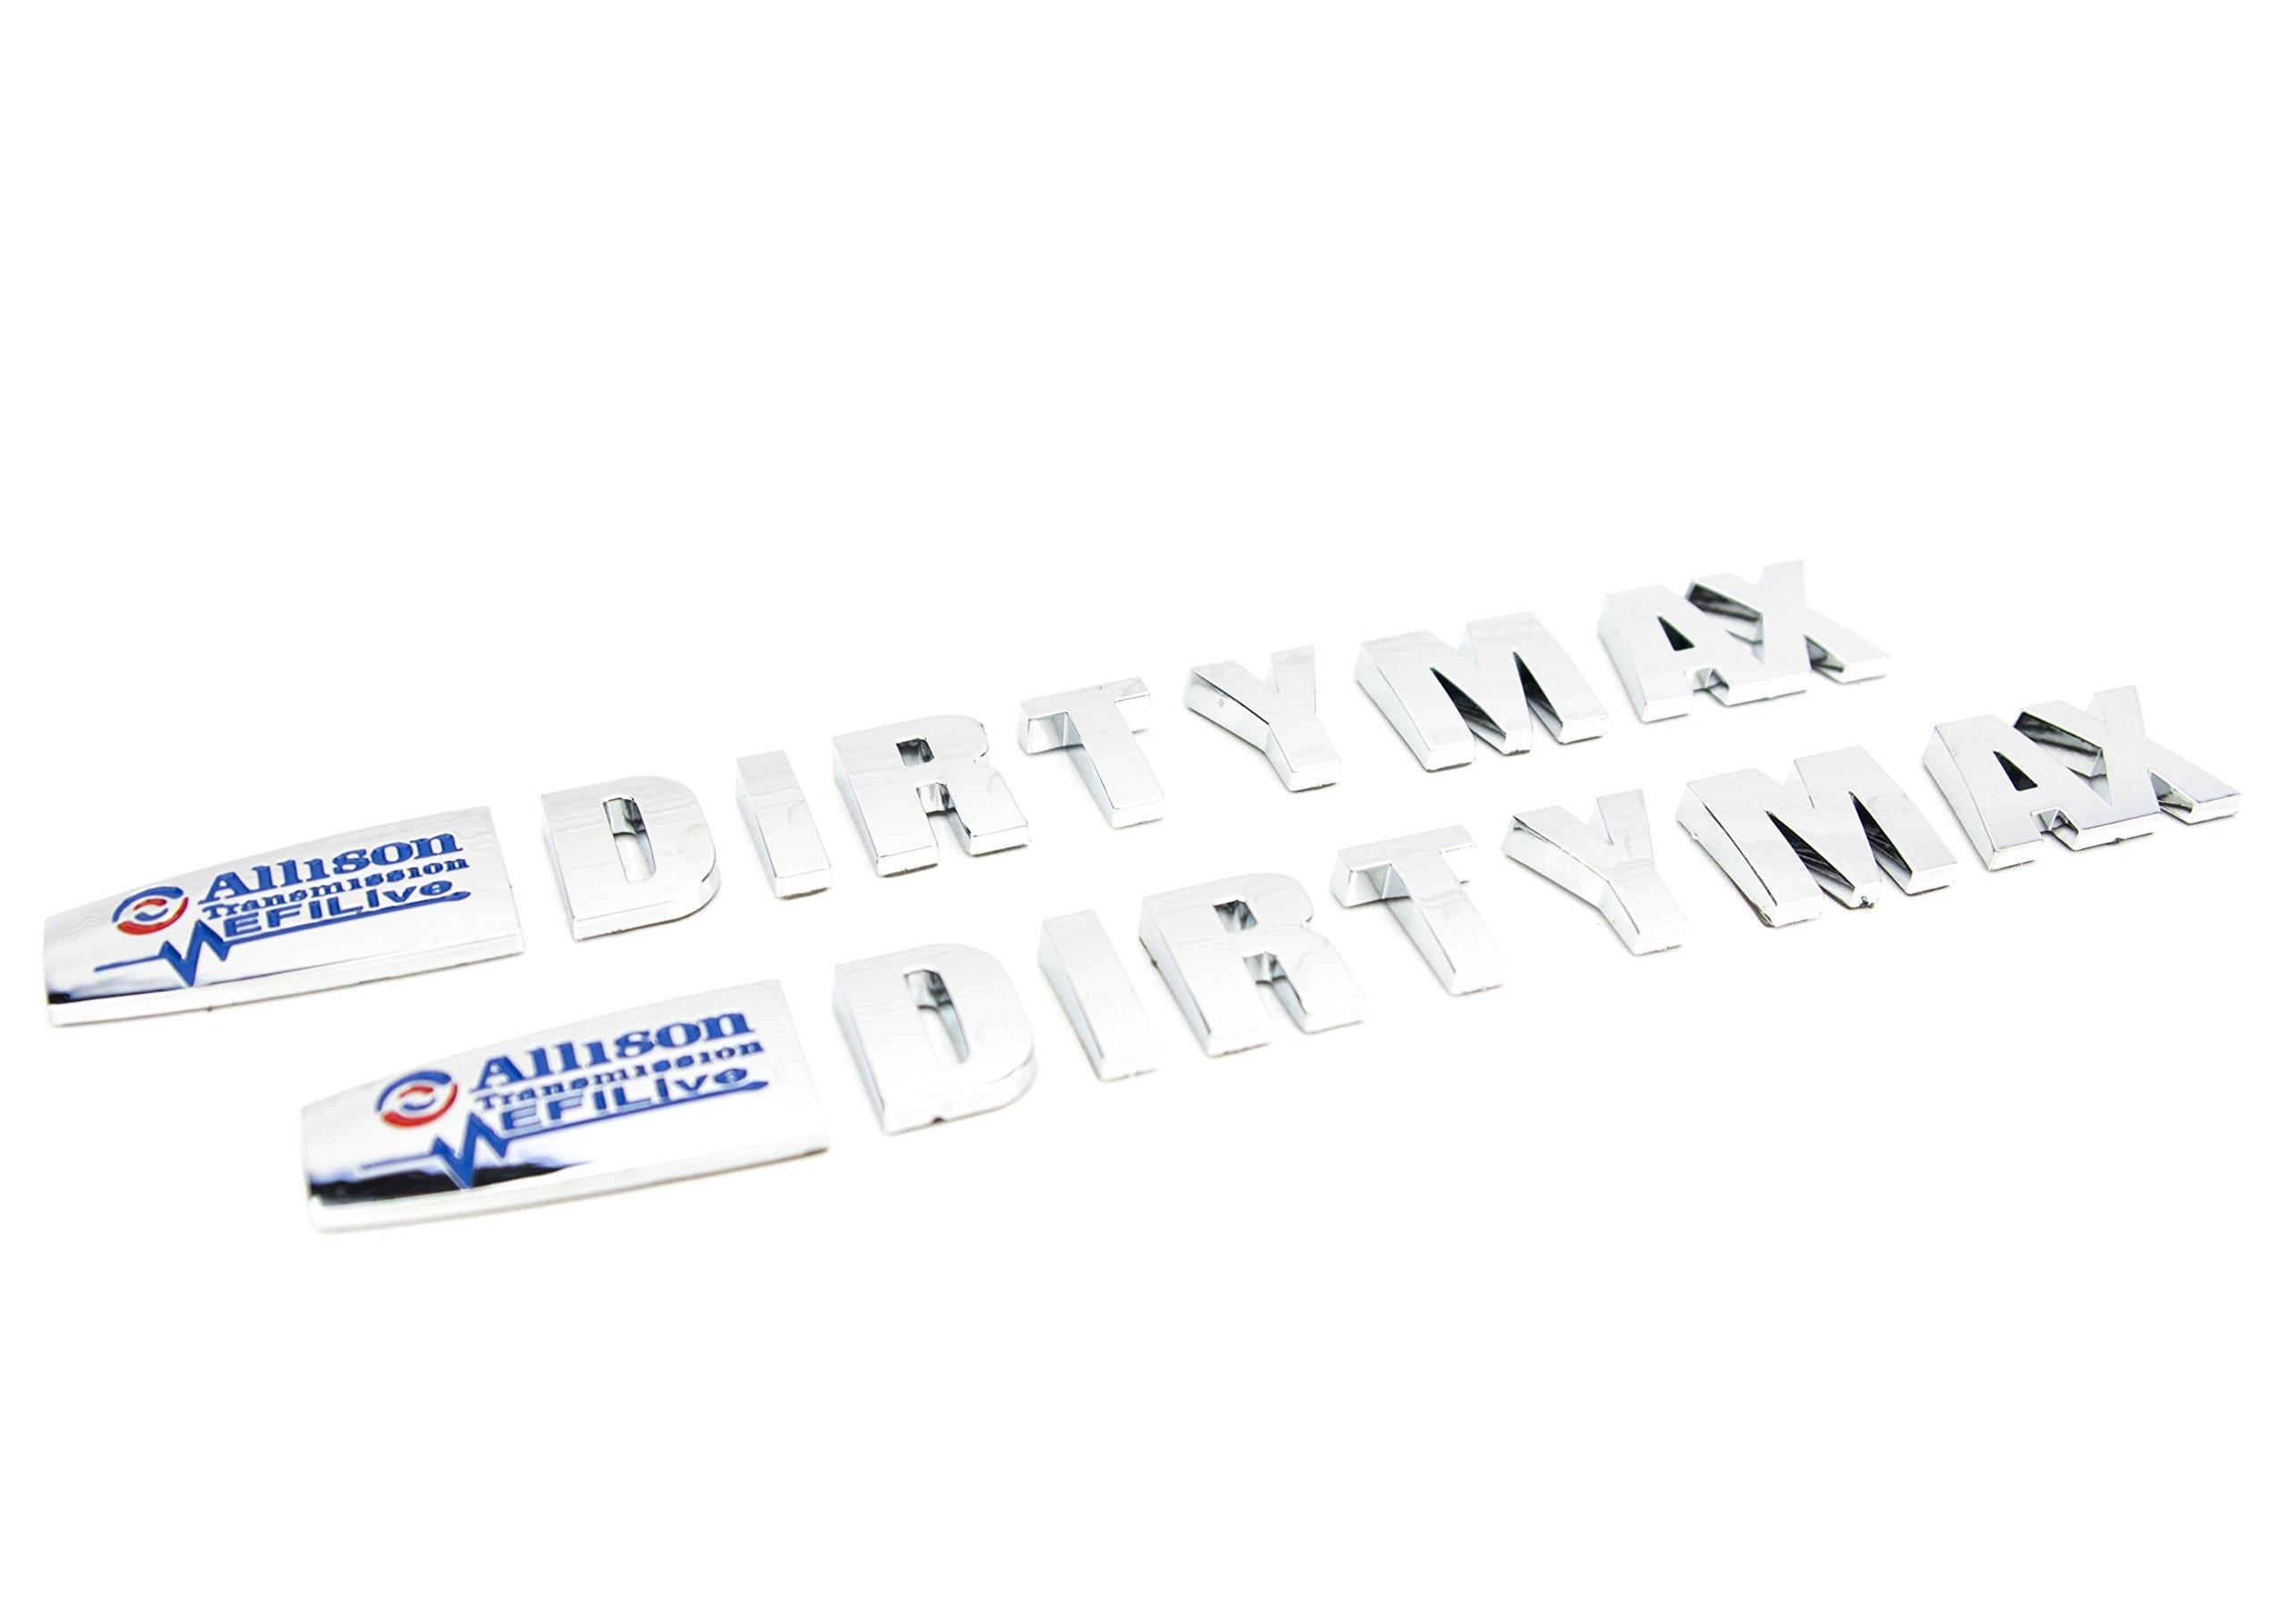 1 New Duramax Diesel Allison EFI Live LML 14-16 Style Truck Key Chain Badge